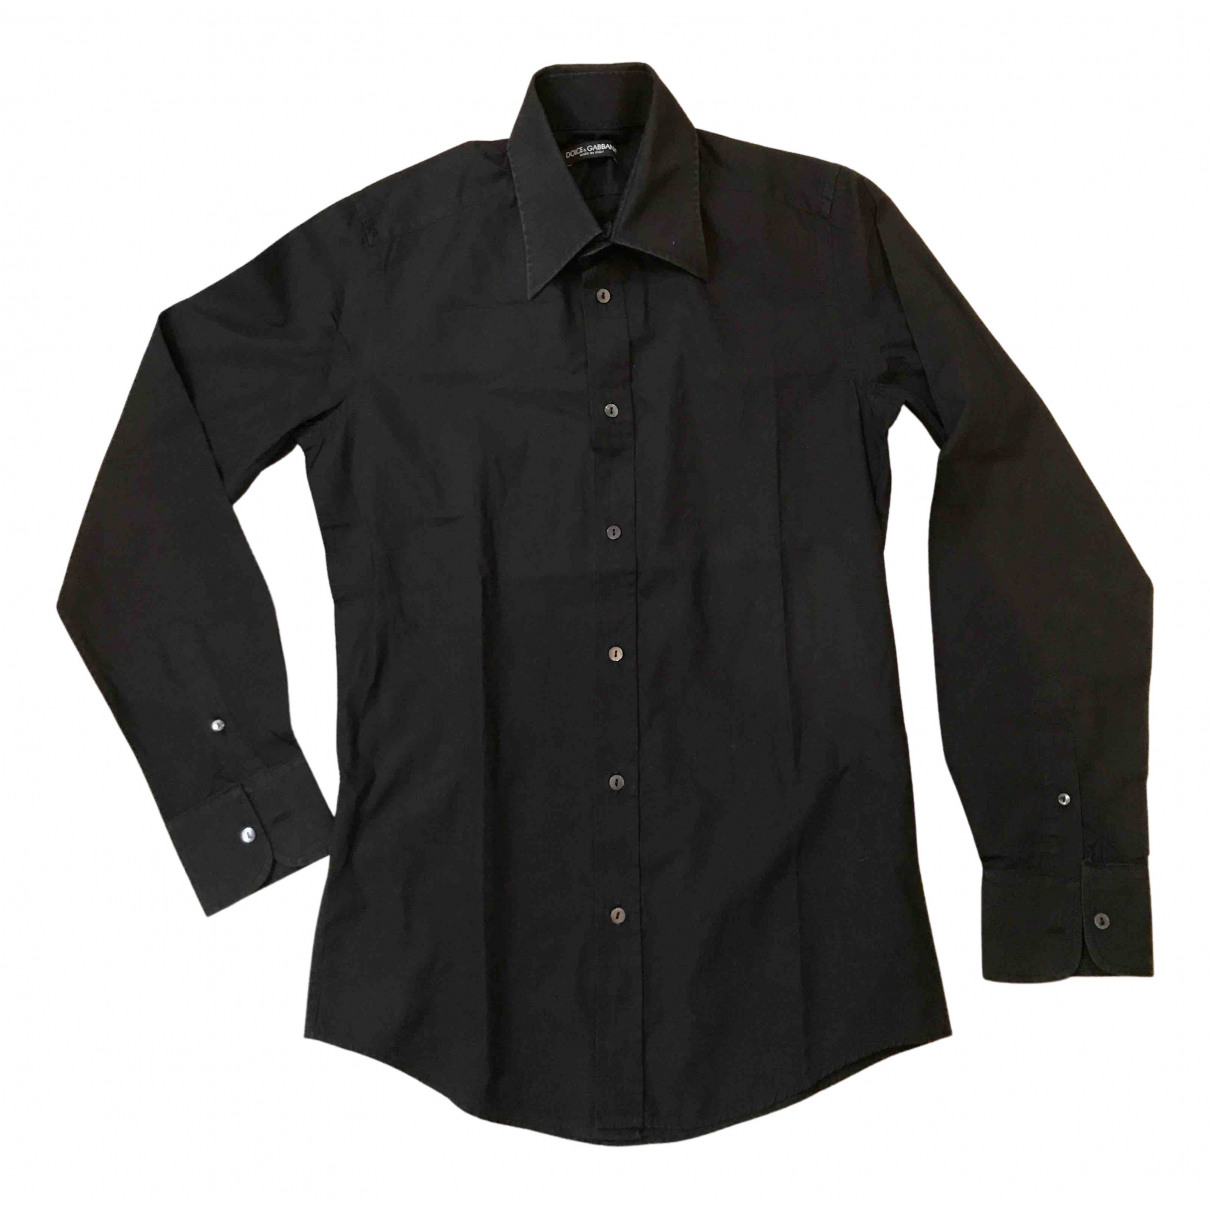 Dolce & Gabbana N Black Cotton Shirts for Men 39 EU (tour de cou / collar)